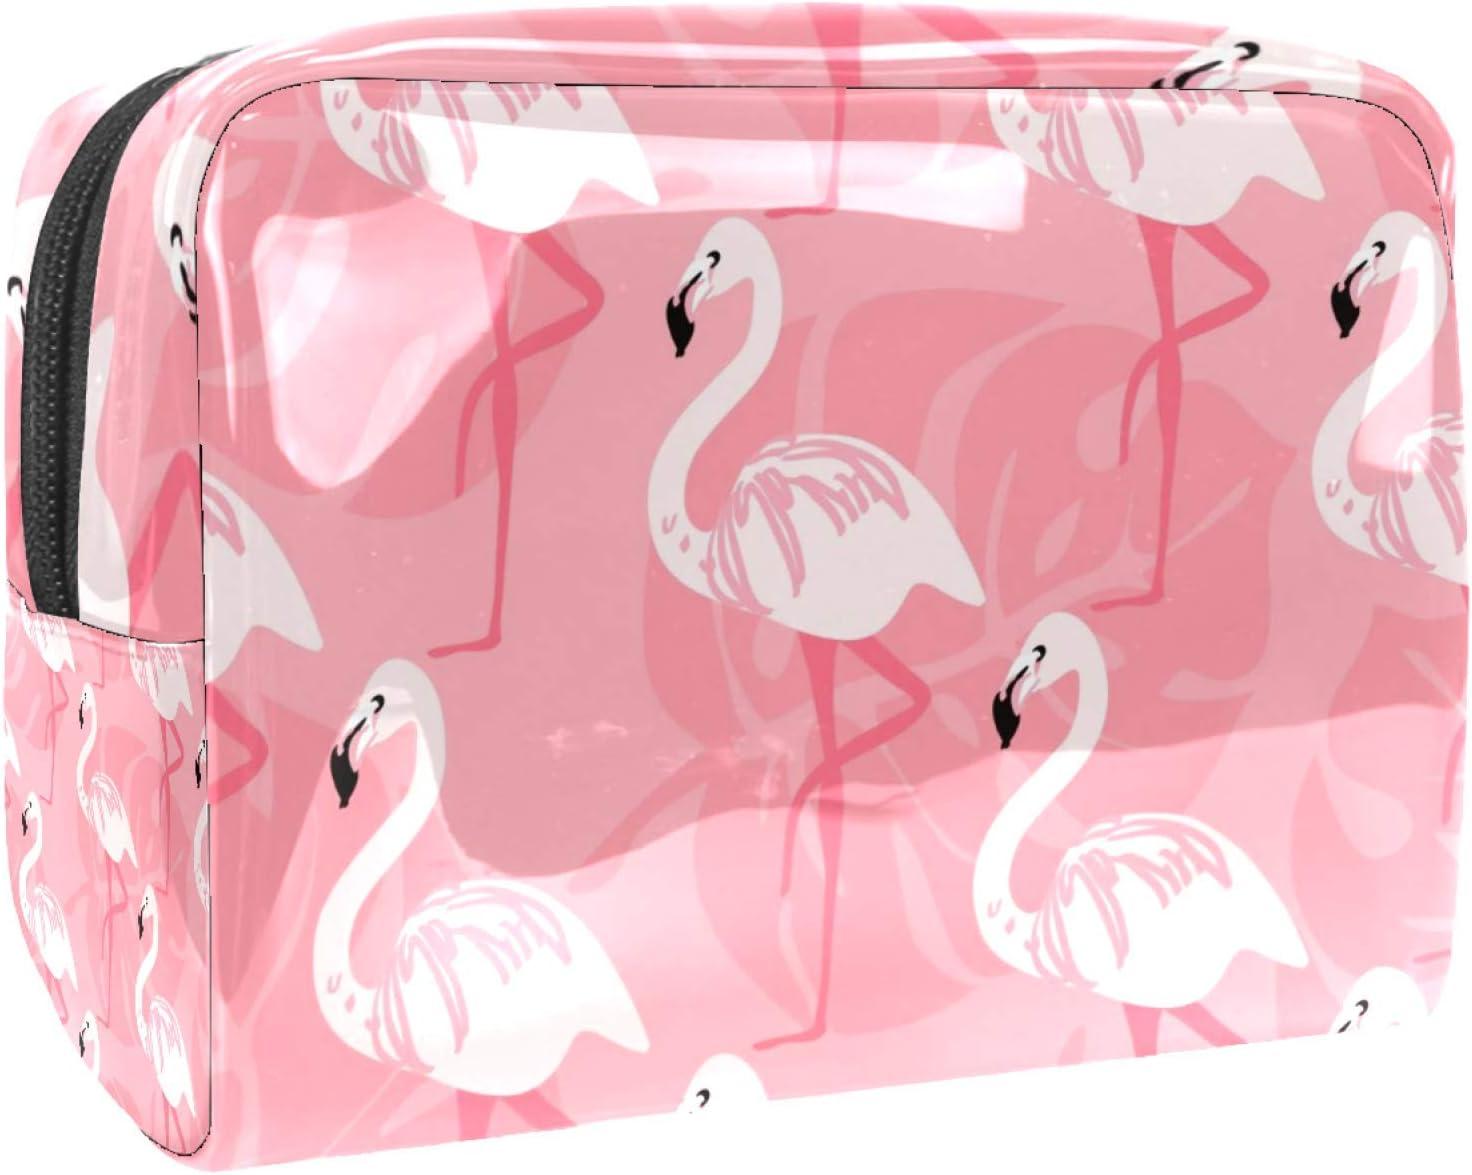 Cosmetic cheap Bag for Women price Roomy seamless Cartoon Bags Makeup flamin